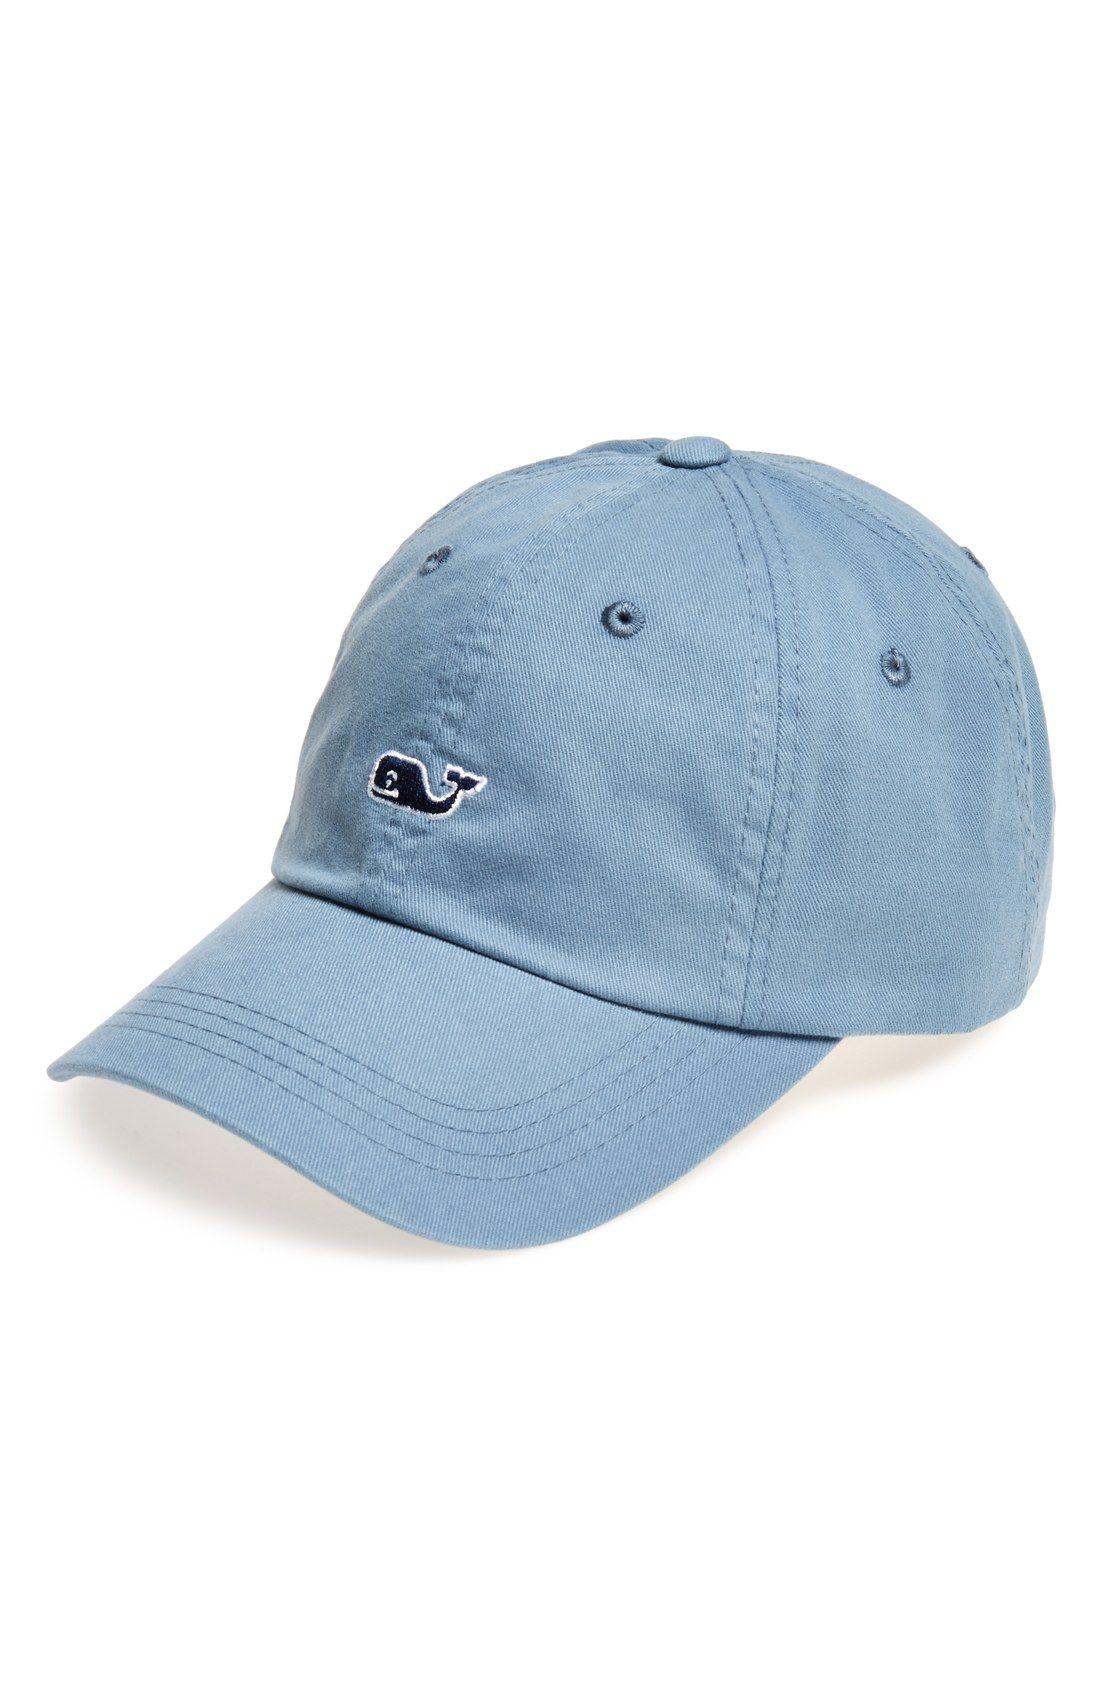 4ad6ec36b46 Vineyard Vines  Whale Logo  Cap